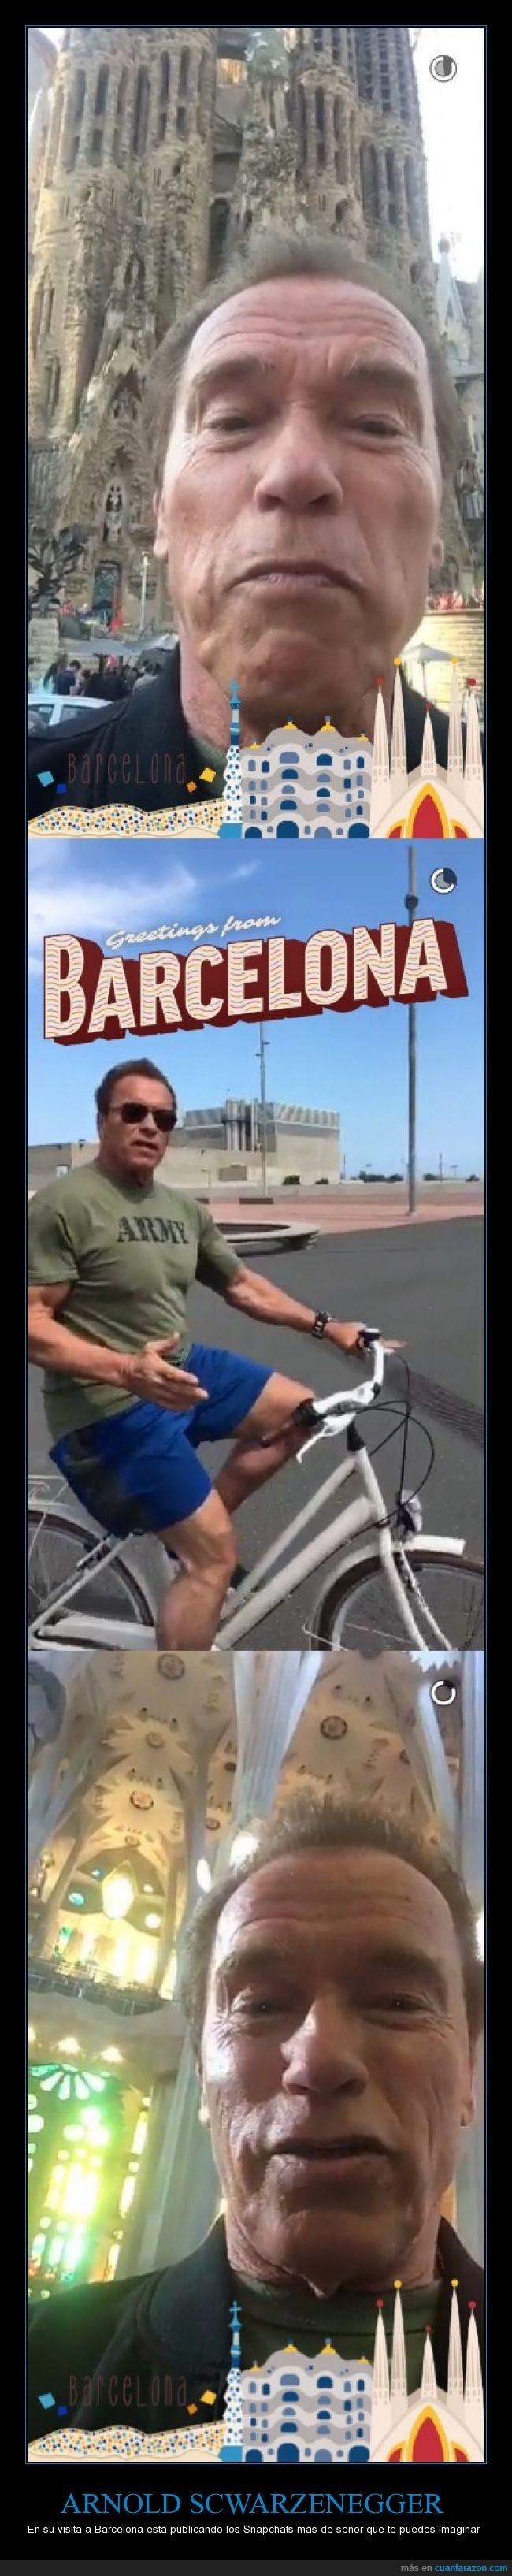 Arnold Schwarzenegger,barcelona,sagrada familia,snapchat